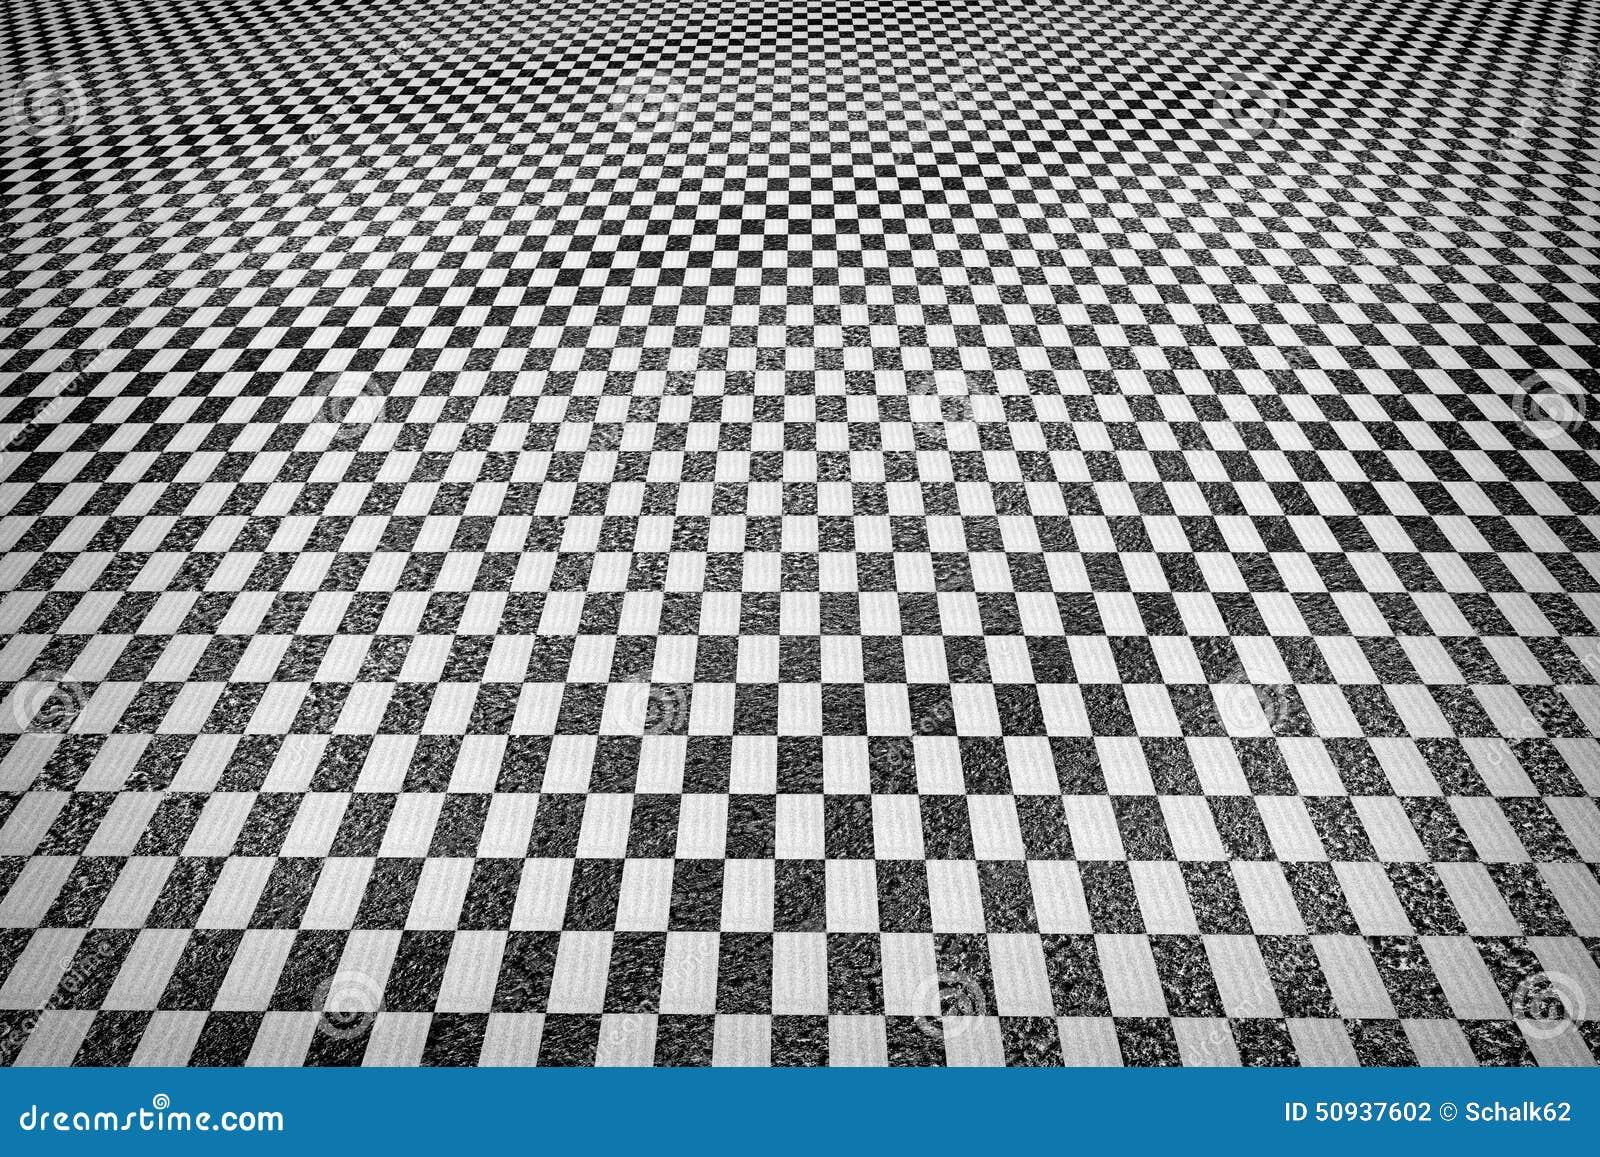 Funny floor stock illustration  Illustration of abstract